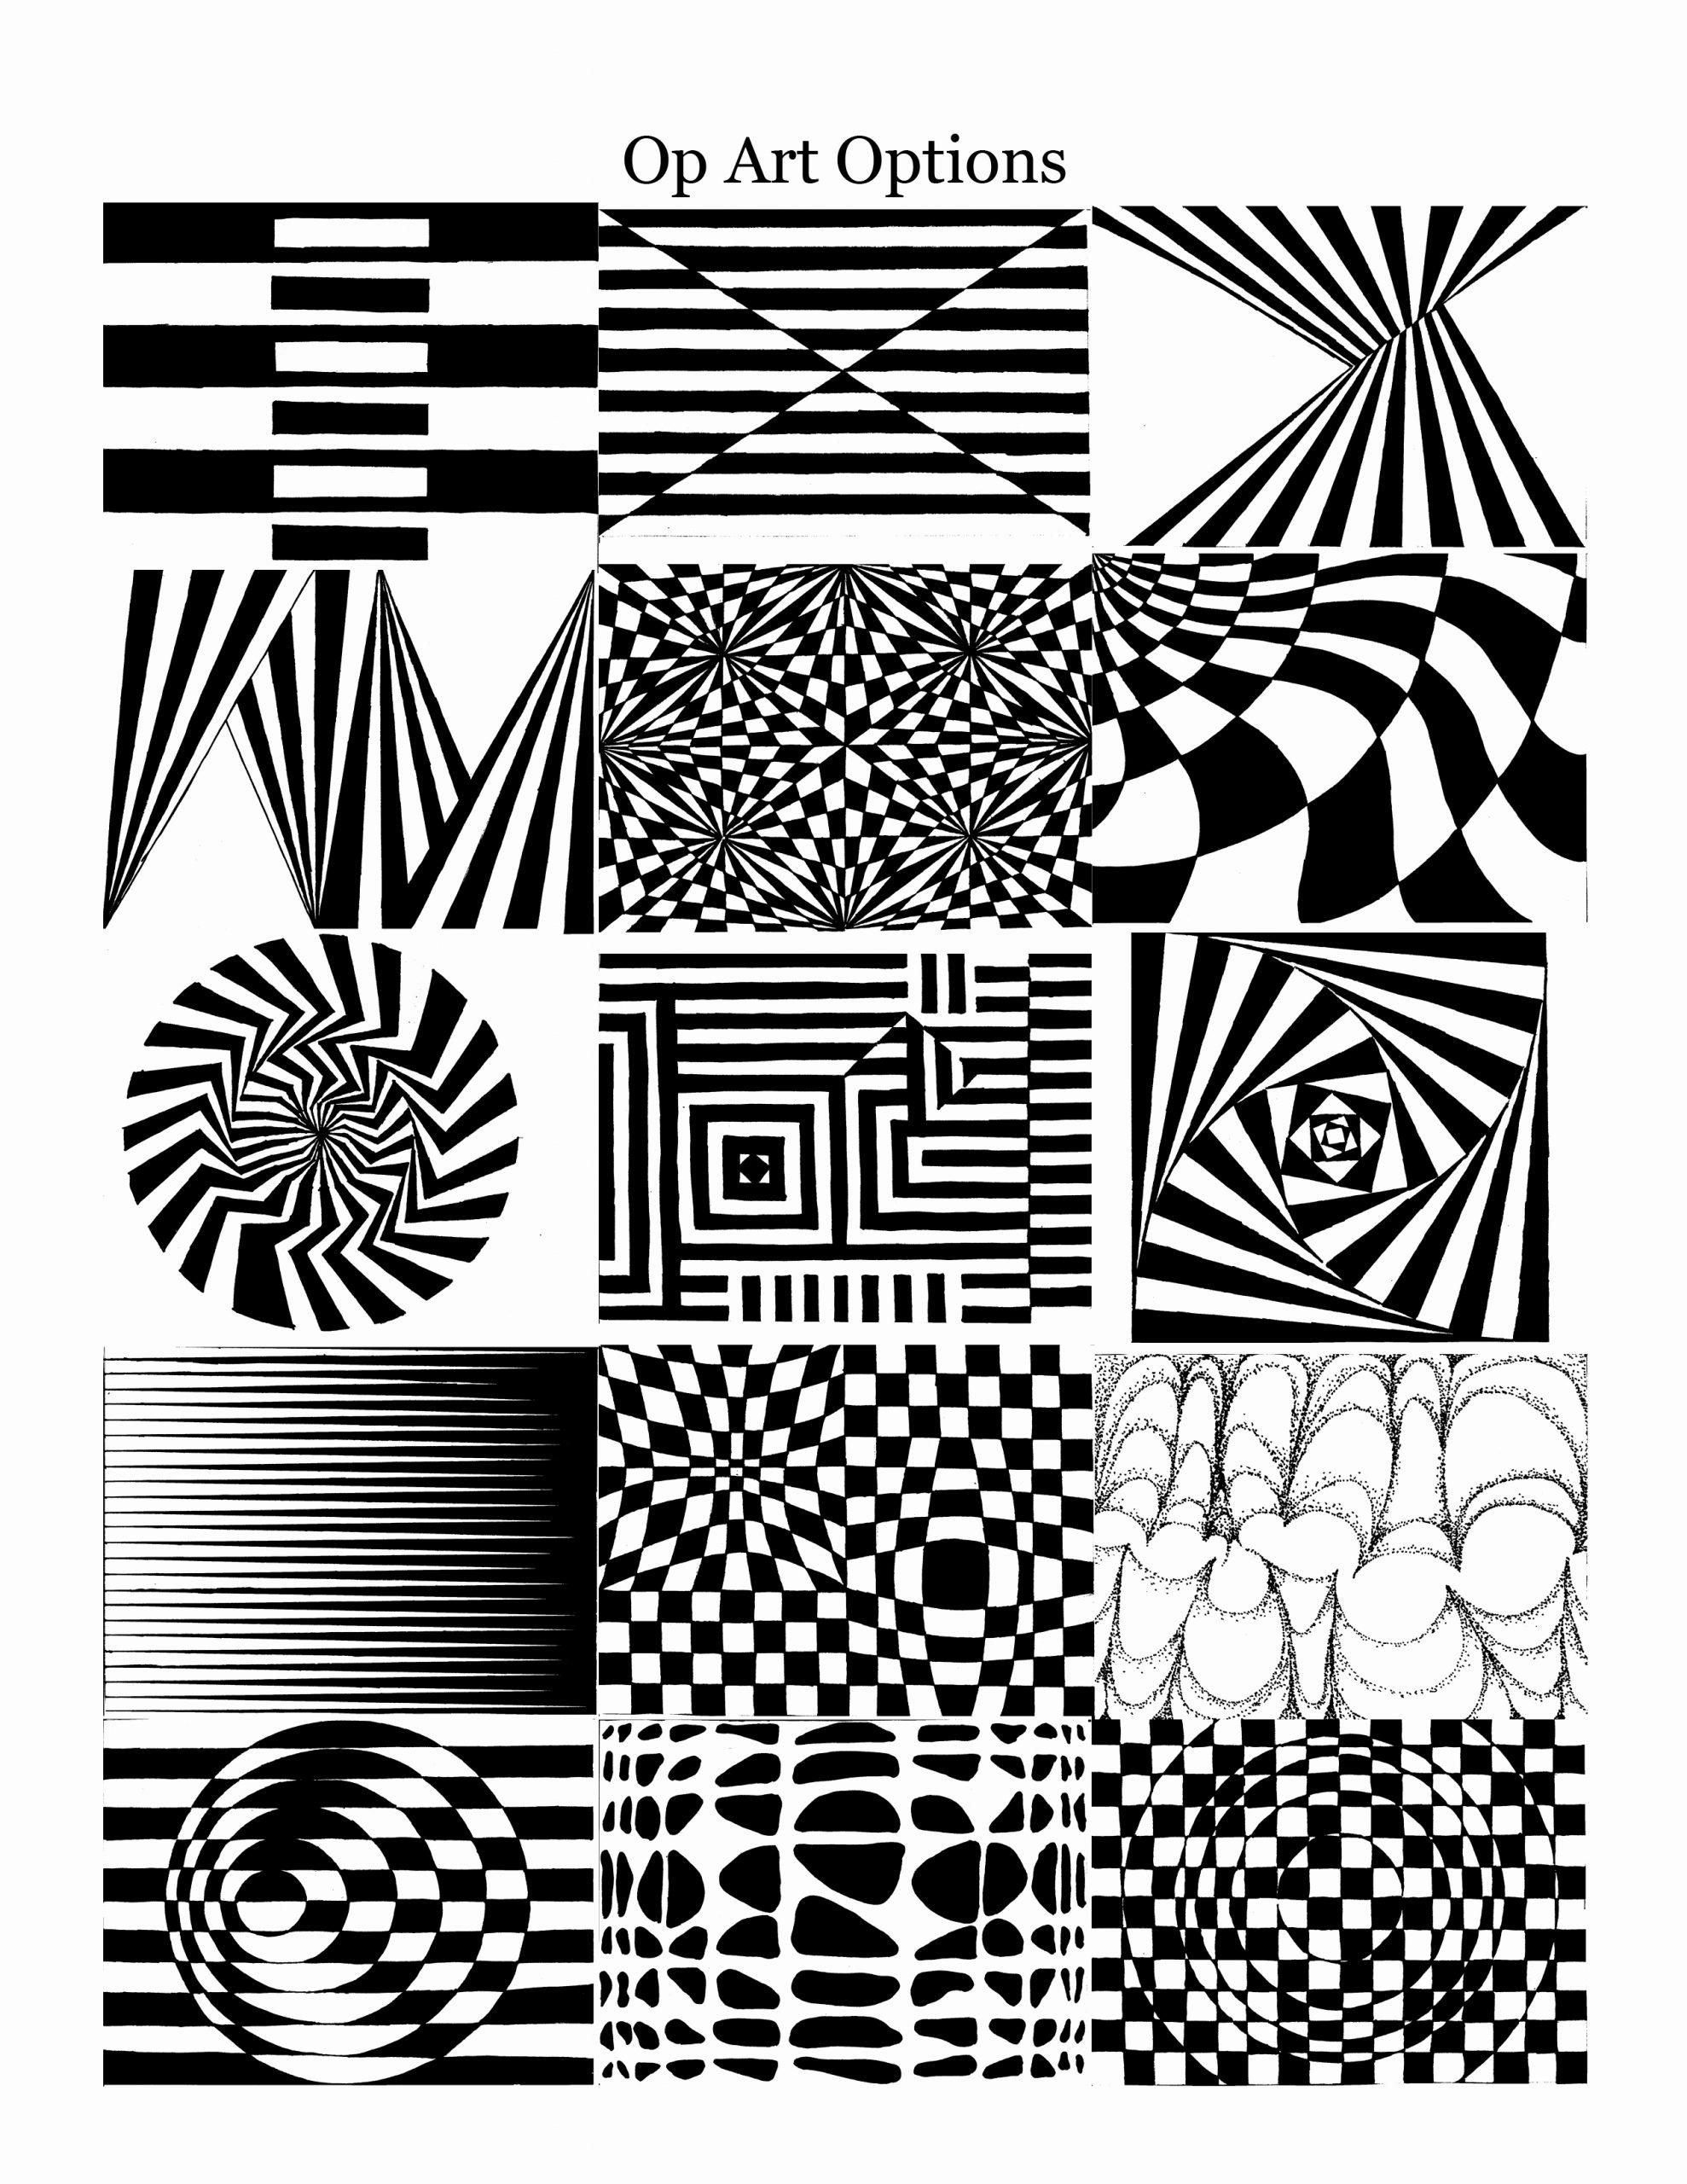 Optical Illusion Worksheets Printable Luxury Optical Illusion Worksheets Printable